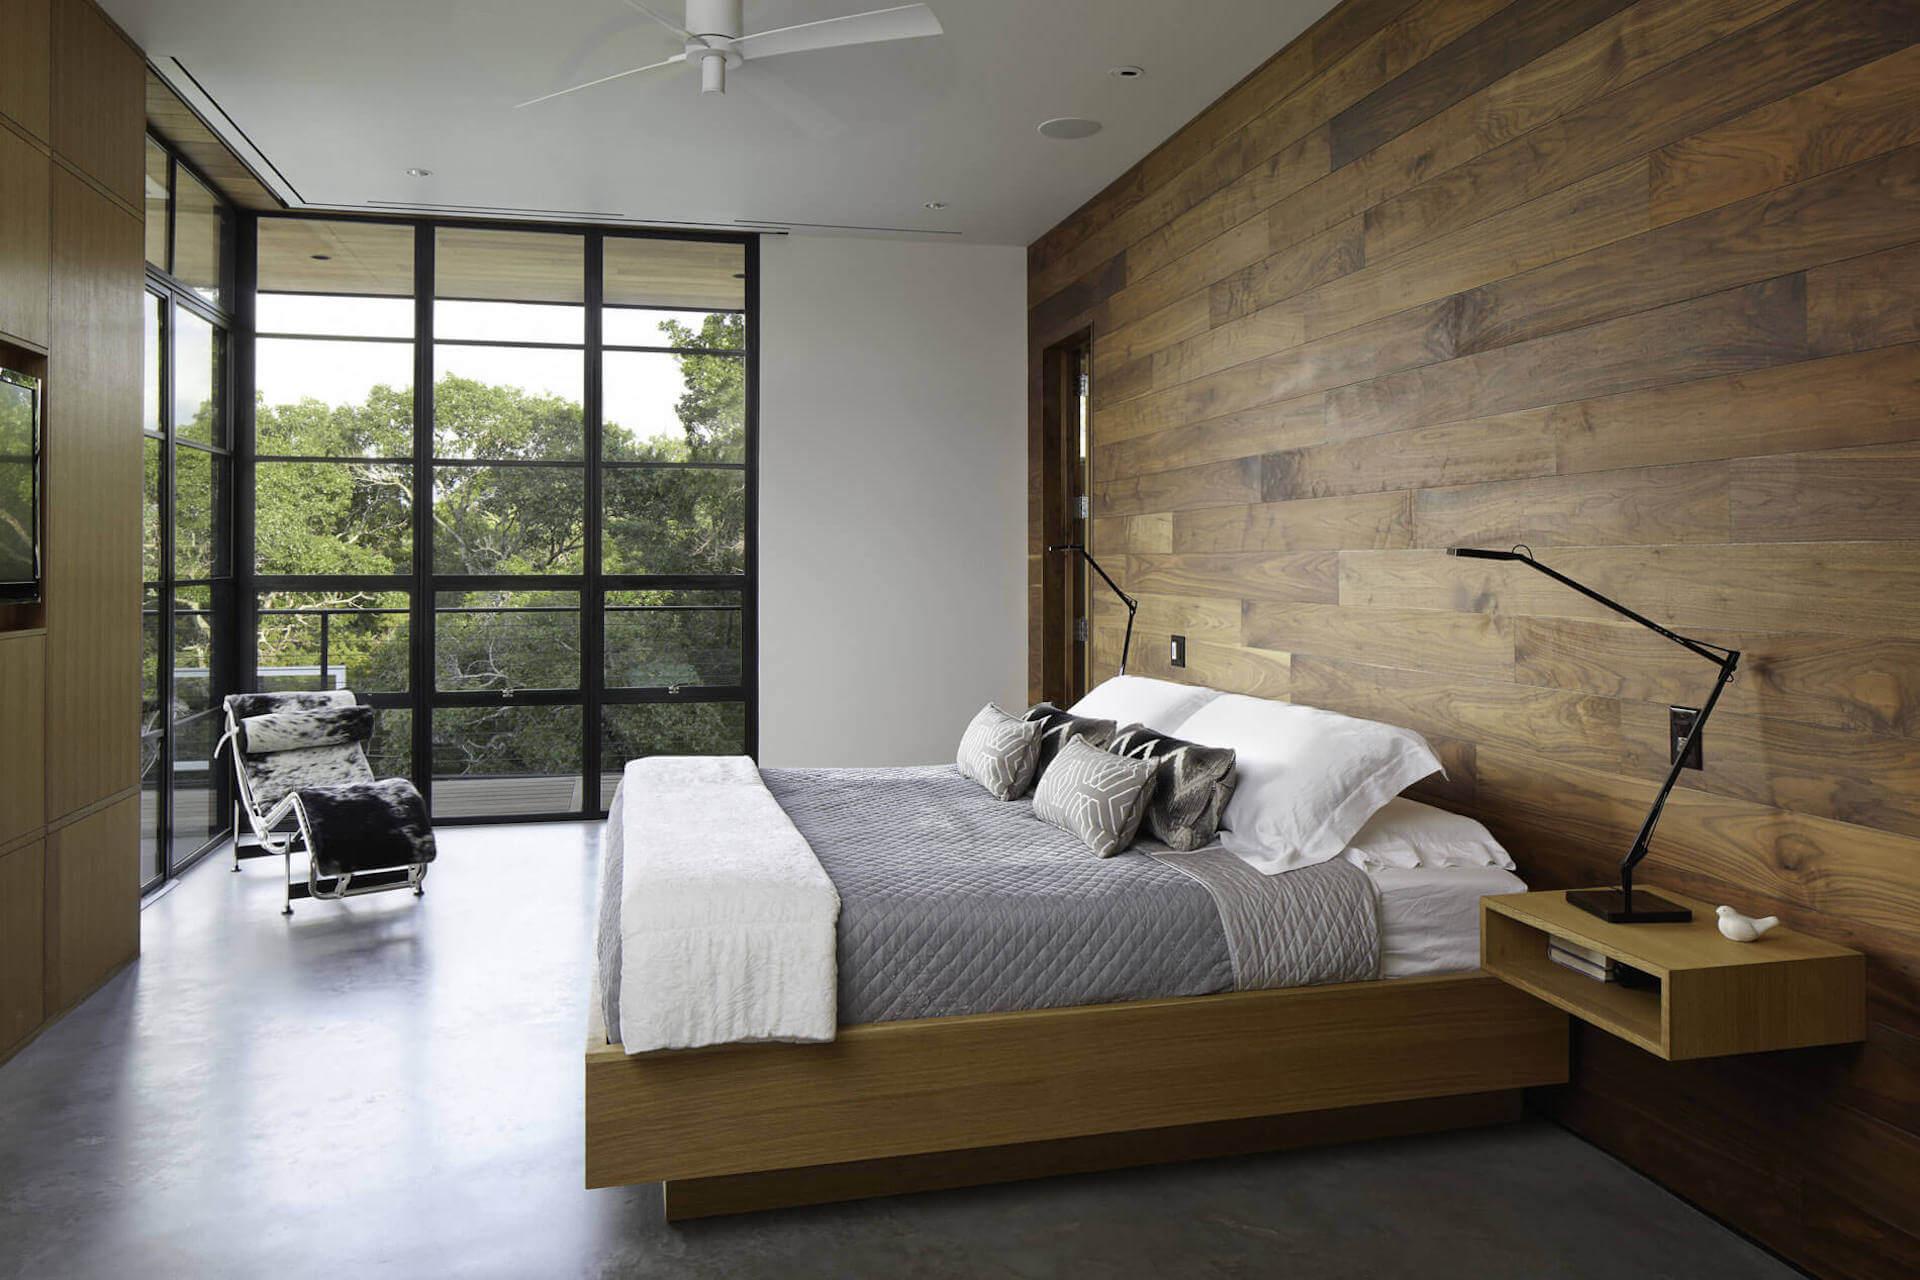 simple-minimalist-bedroom-interior-design-from-minimalist-bedroom-designs-with-wood-faux-wall.jpg